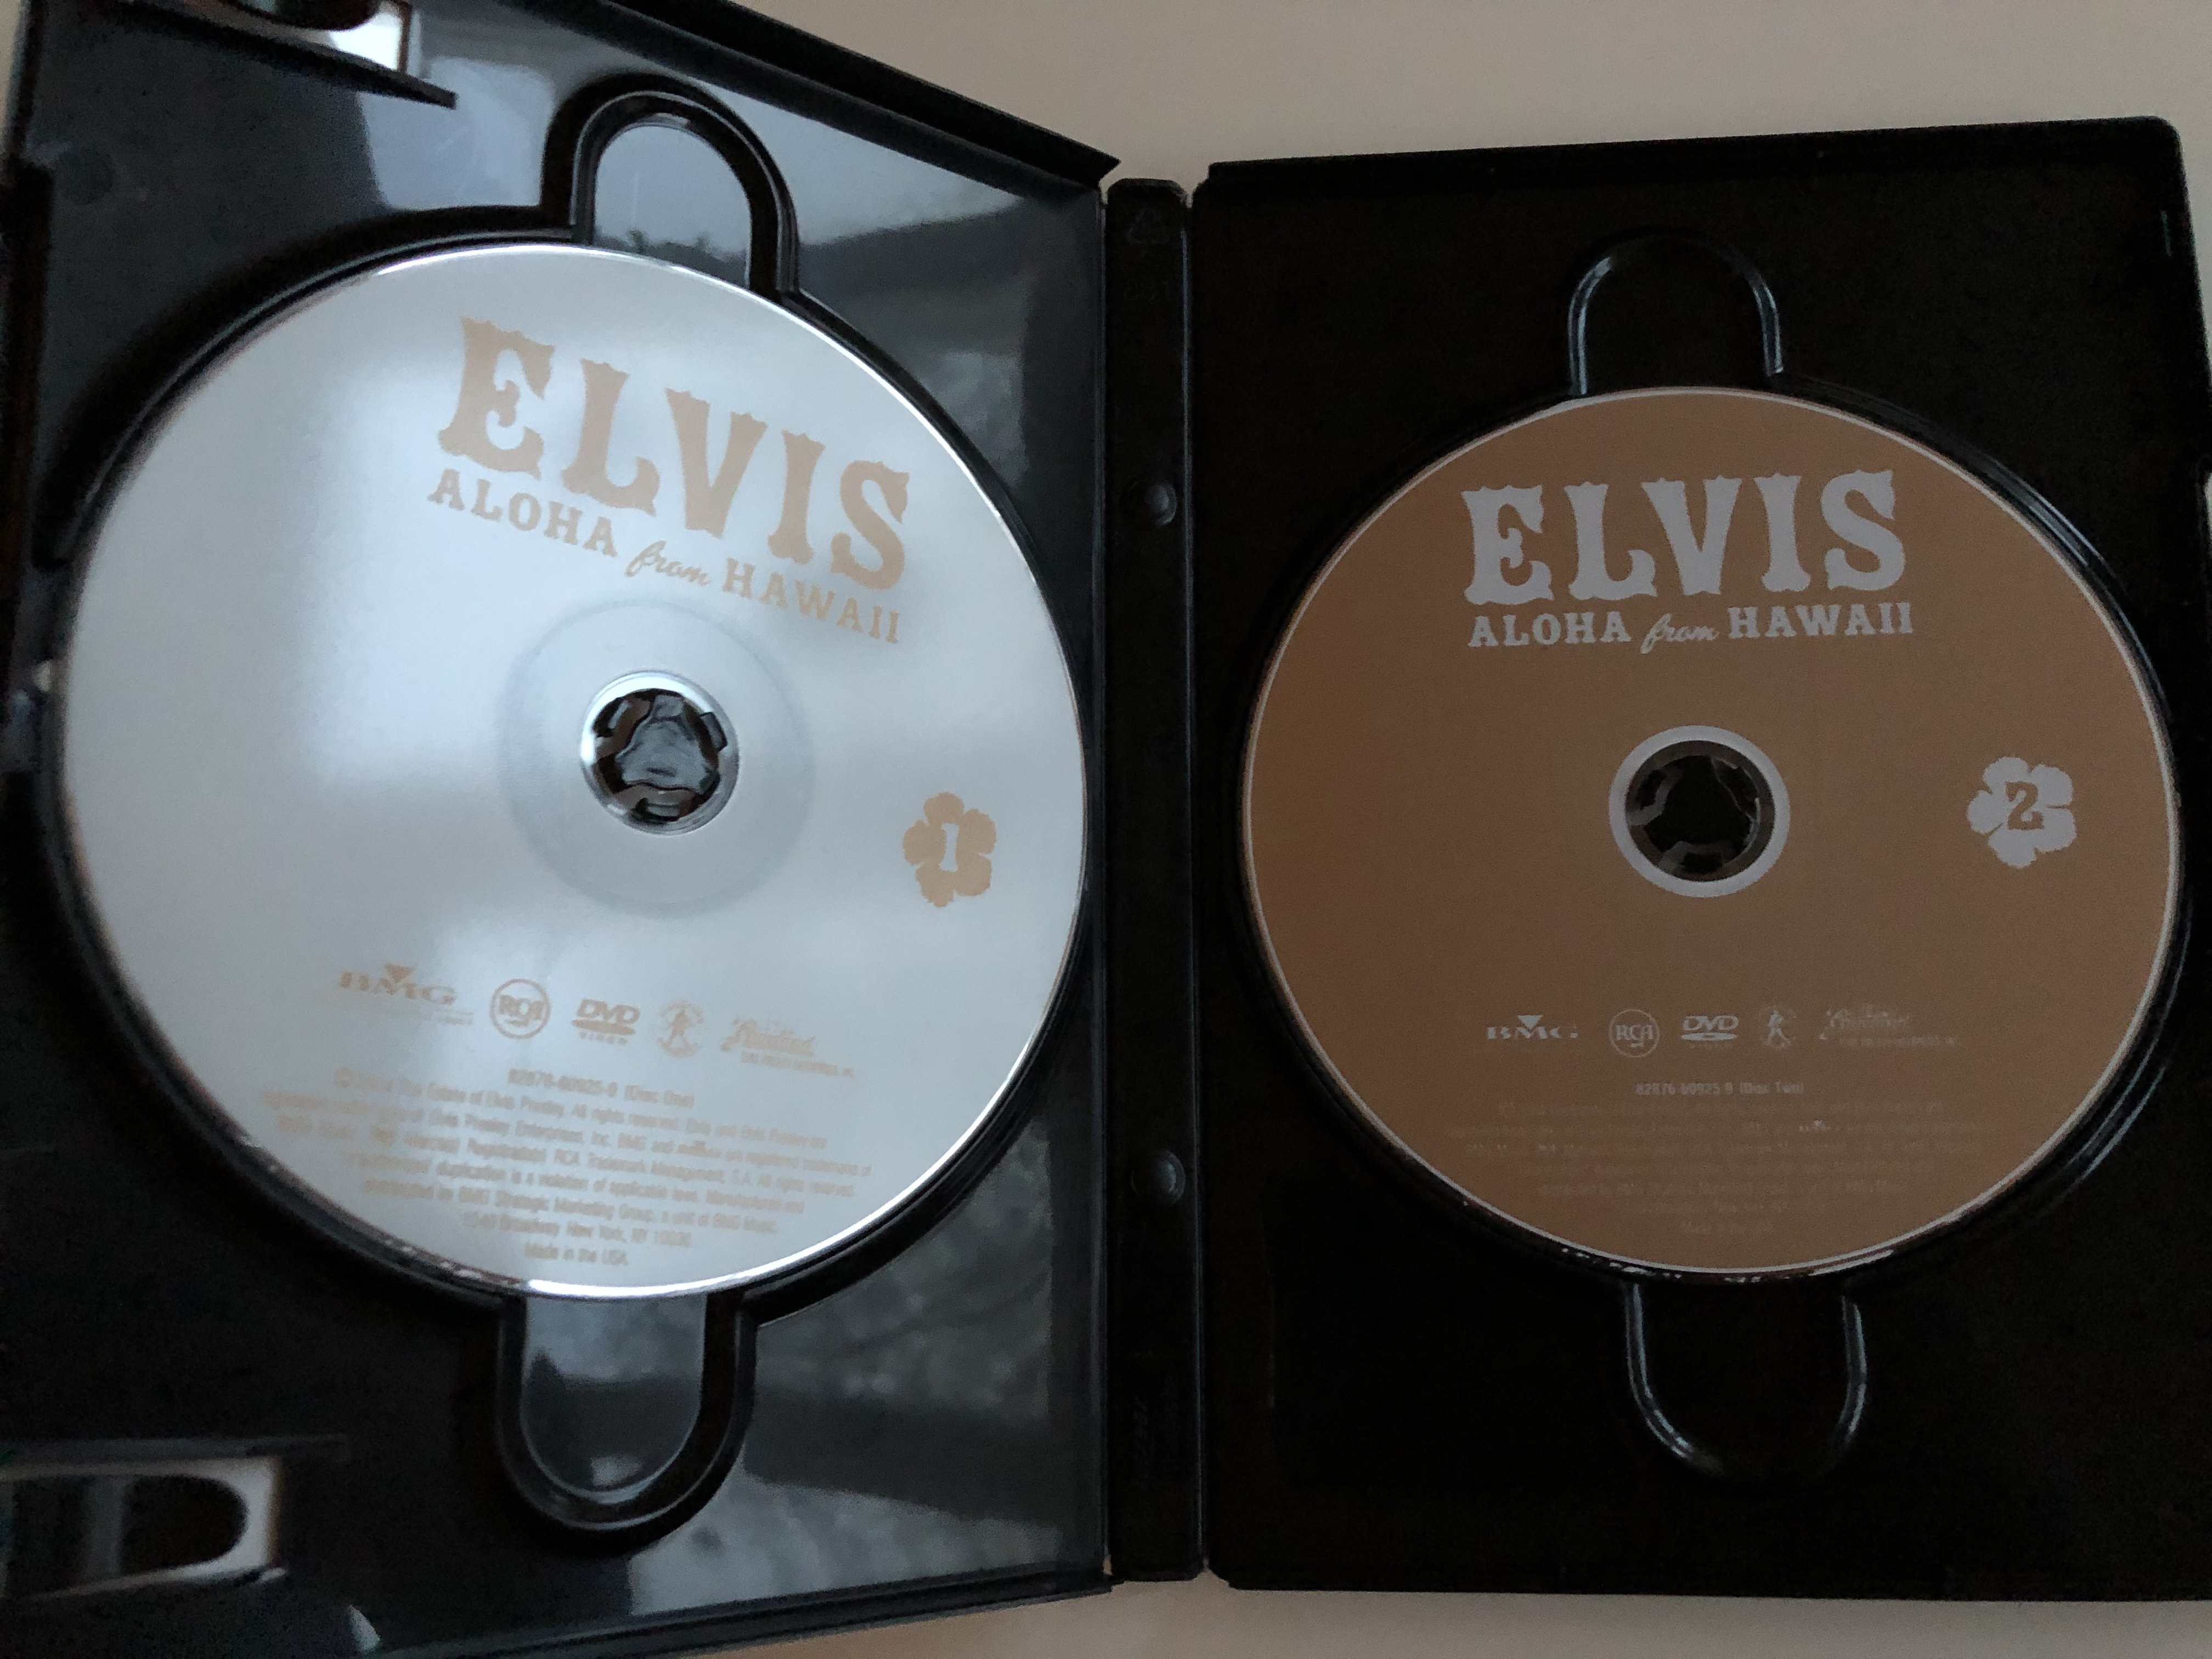 elvis-aloha-from-hawaii-deluxe-edition-dvd-2004-2x-dvd-set-2.jpg